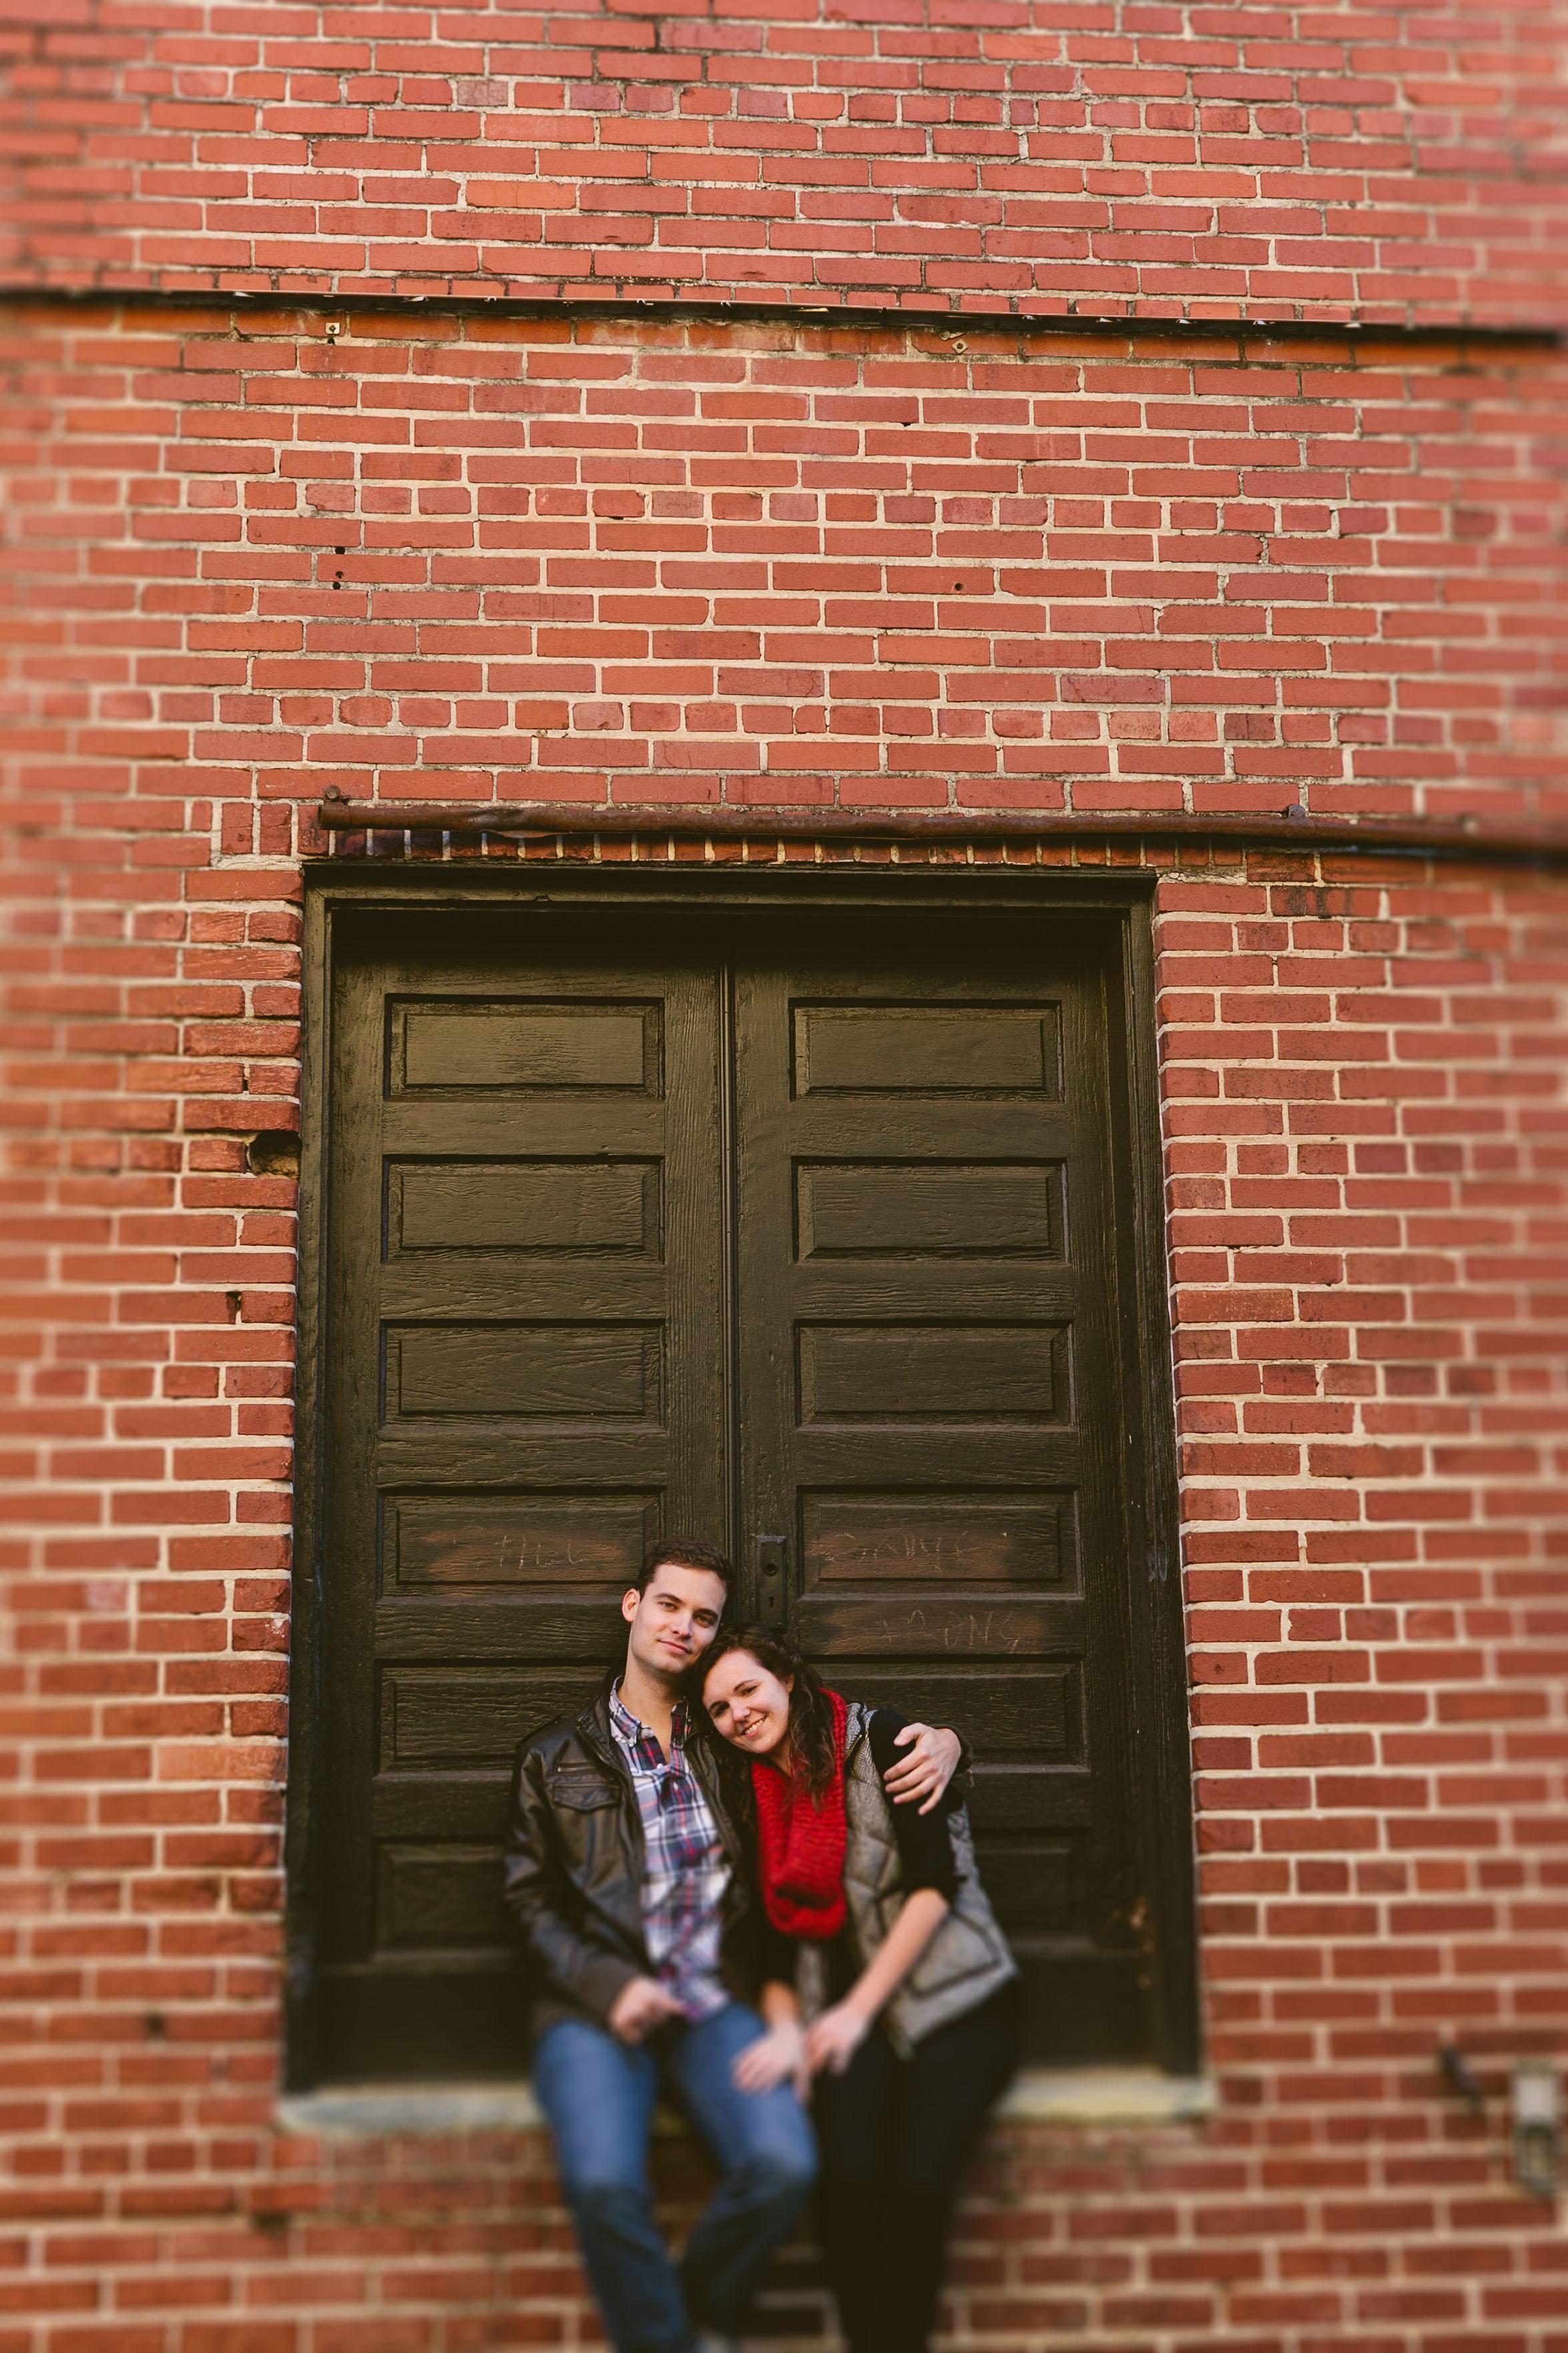 Atlanta-Engagement-Photographer-Kathryn-McCrary-Photography-Piedmont-Park-Virginia-Highlands-Fall-Engagement-Shoot-6.jpg